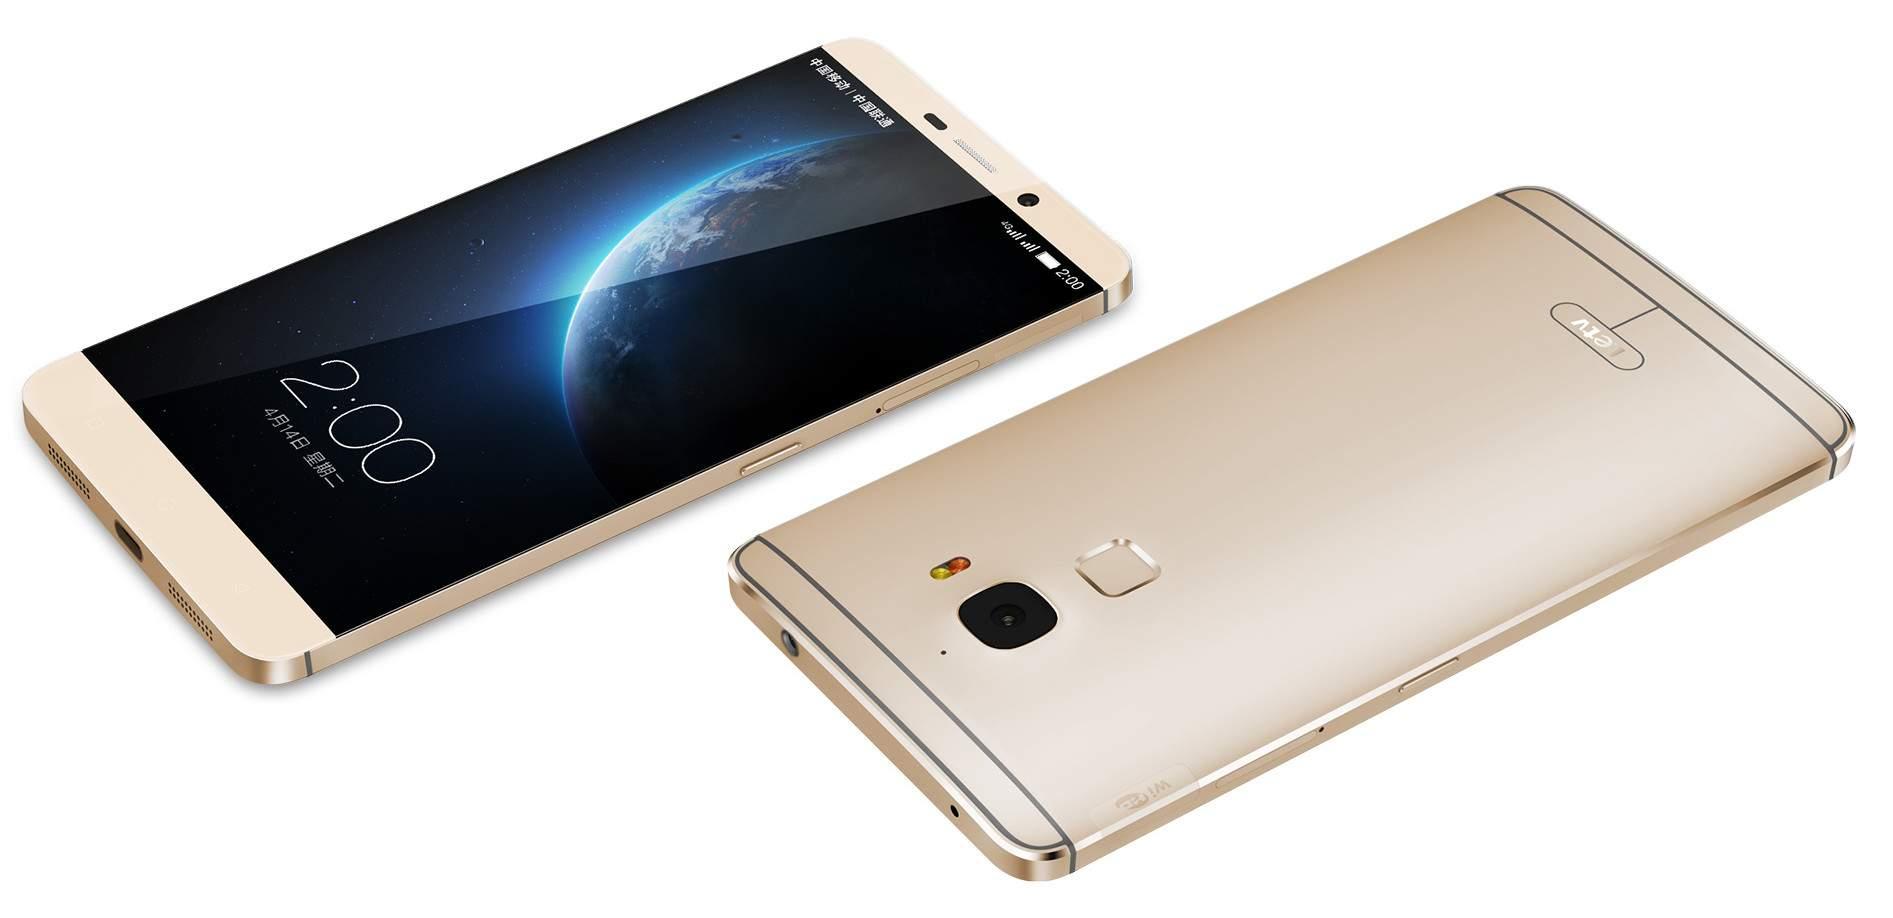 LeTV Le Max, Handphone Octa Core Berbekal RAM 4GB dan Port USB Type C